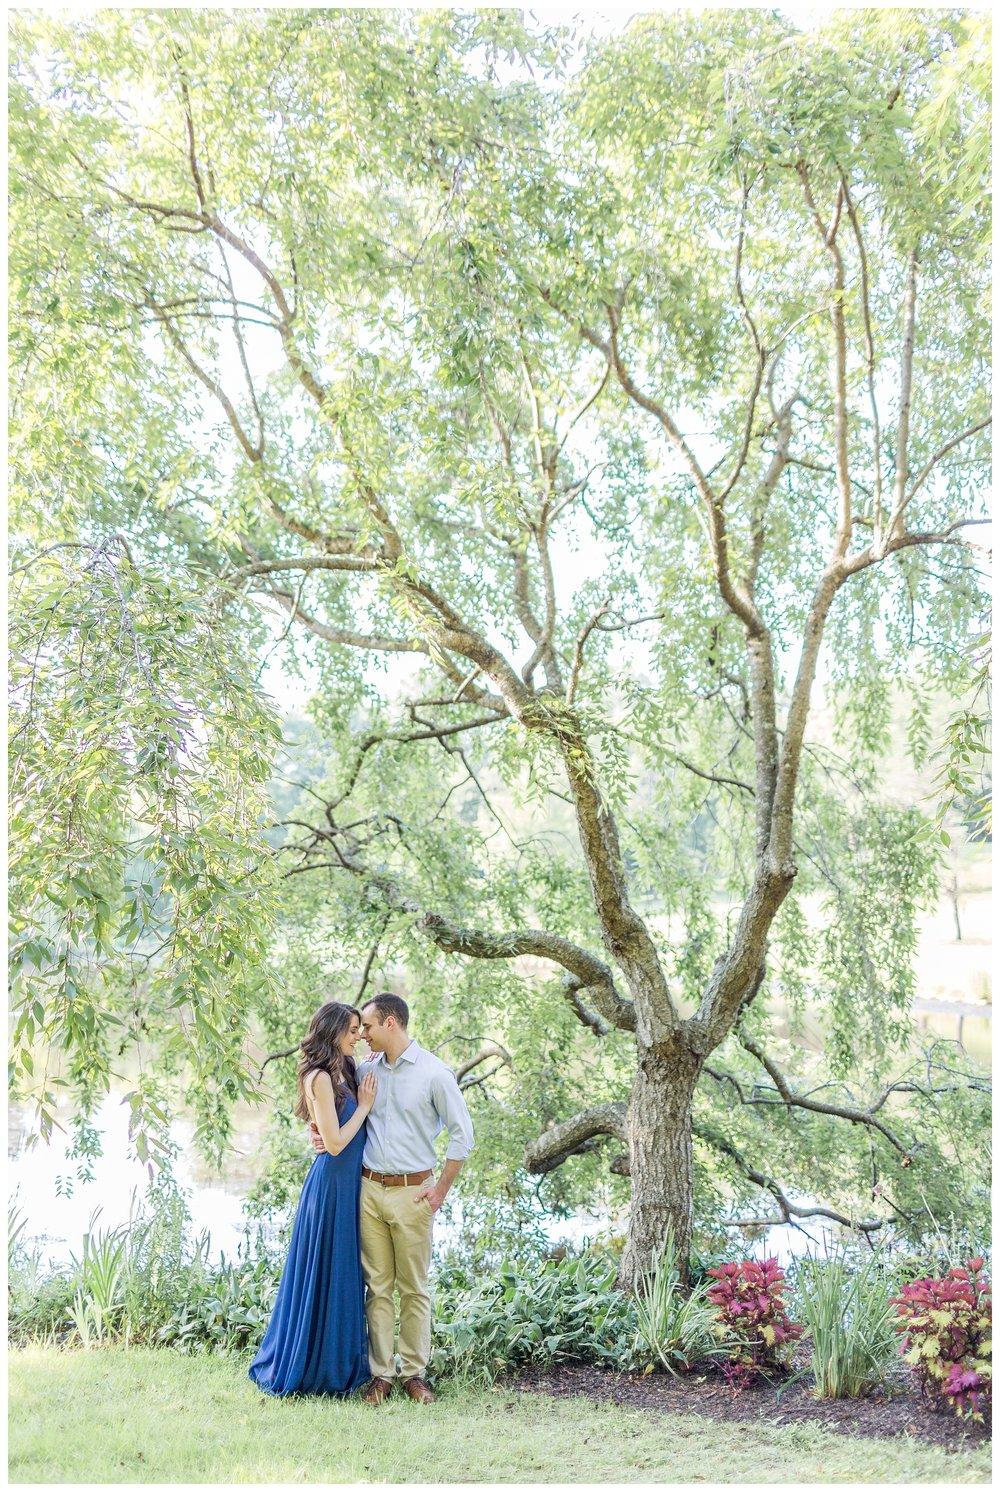 Meadowlark Botanical Garden Engagement | Virginia Wedding Photographer Kir Tuben_0019.jpg